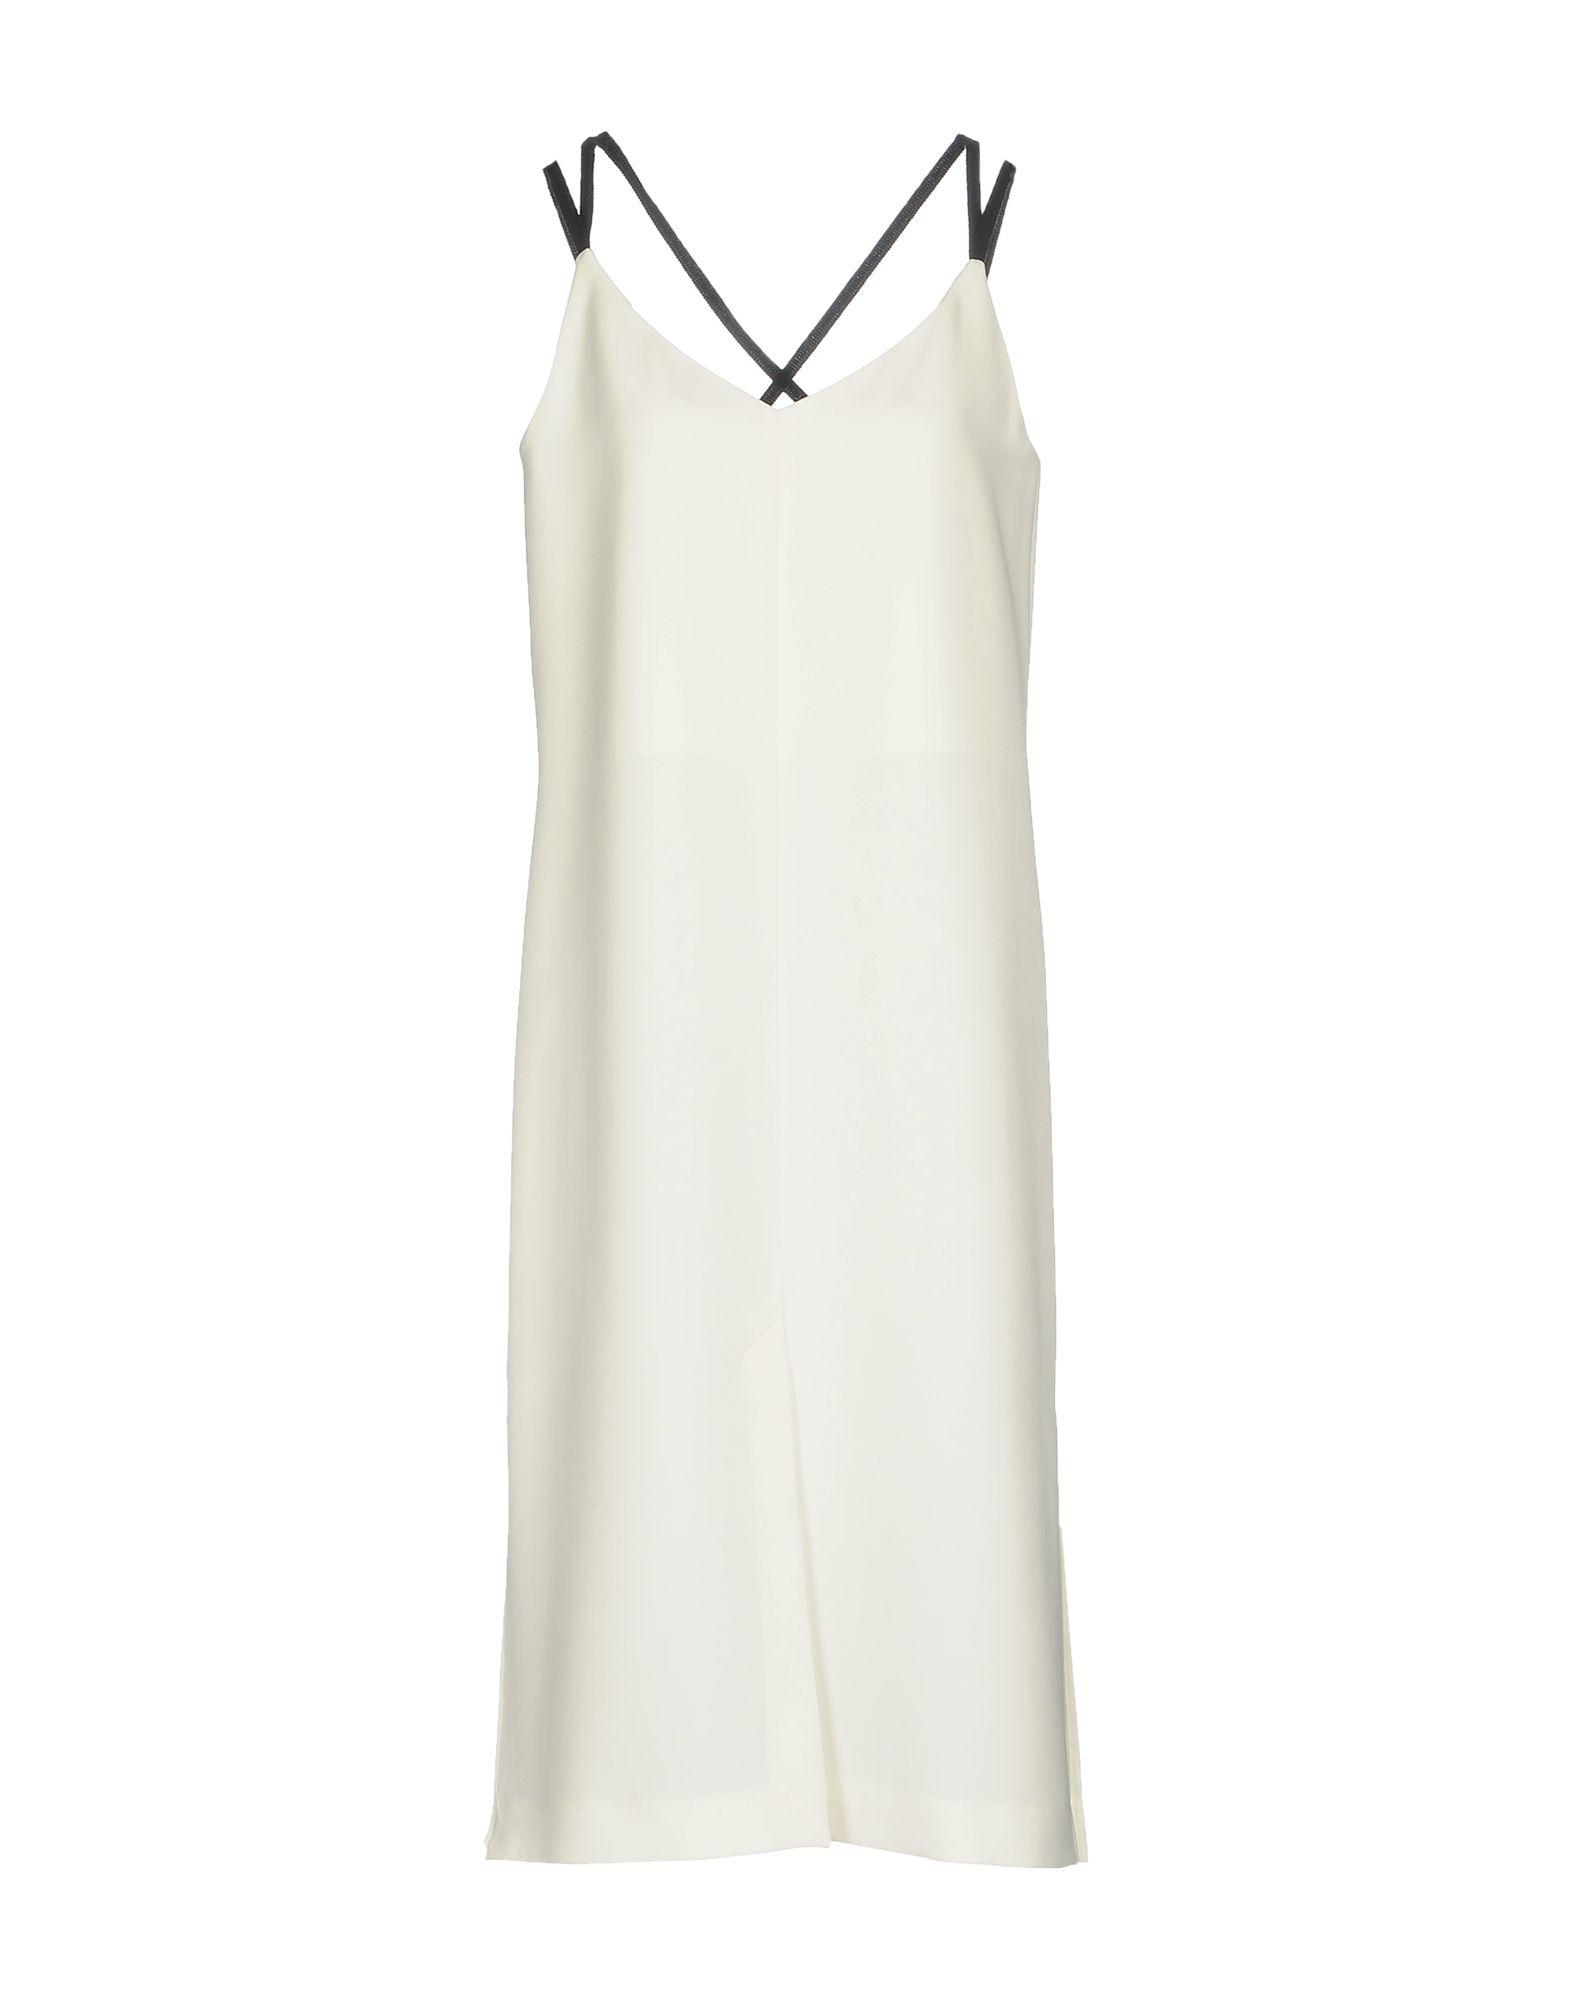 TARA JARMON Платье длиной 3/4 кроссовки reebok gl6000 m41775